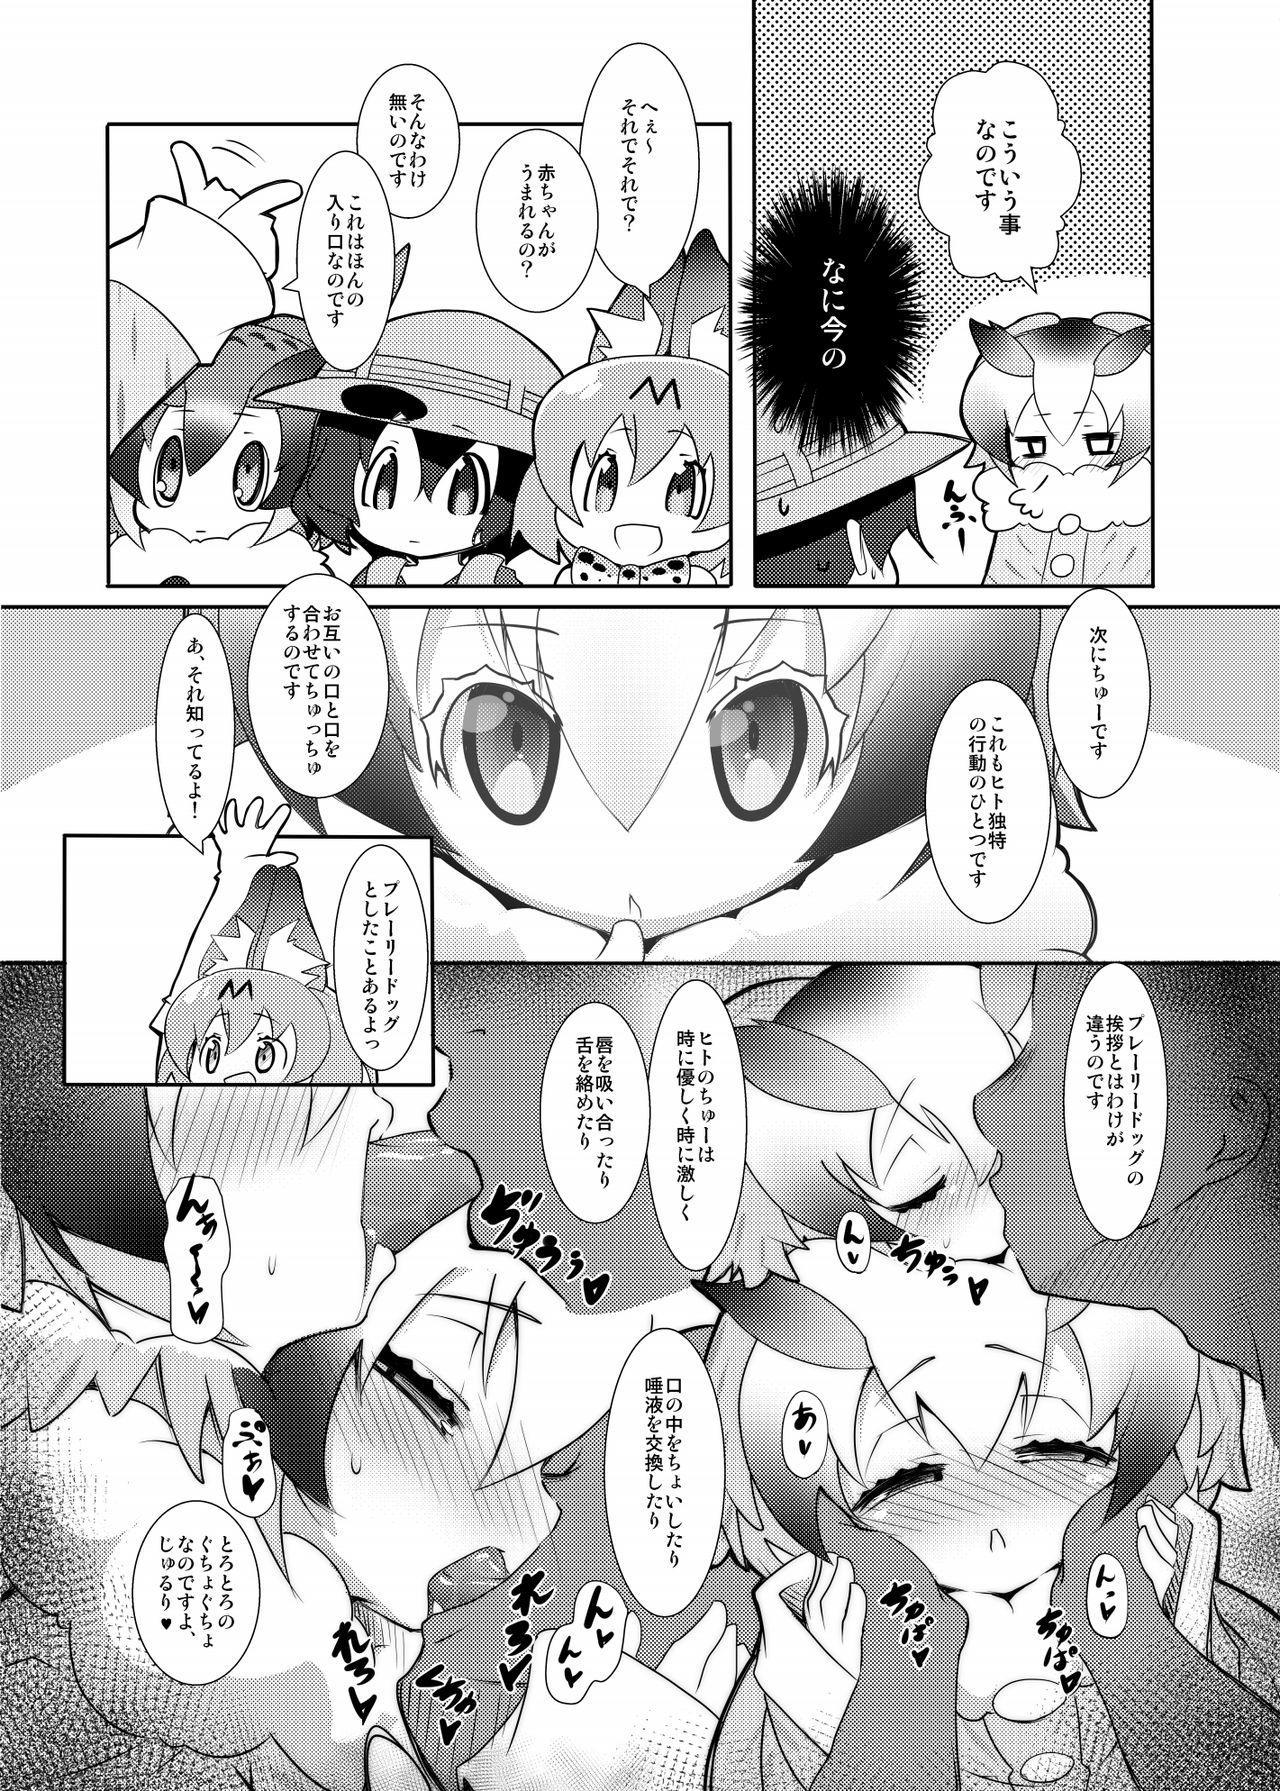 Hakase no How to Hanshoku 7